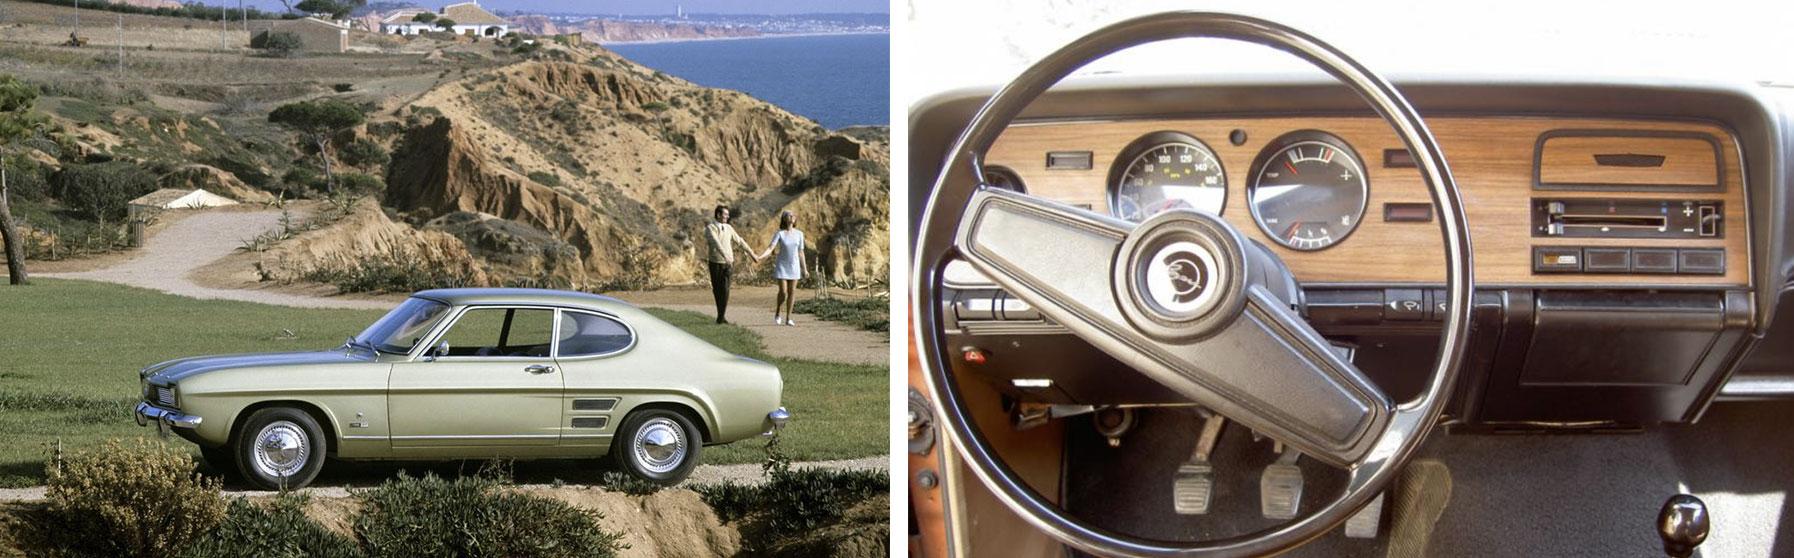 Ford Capri 2600